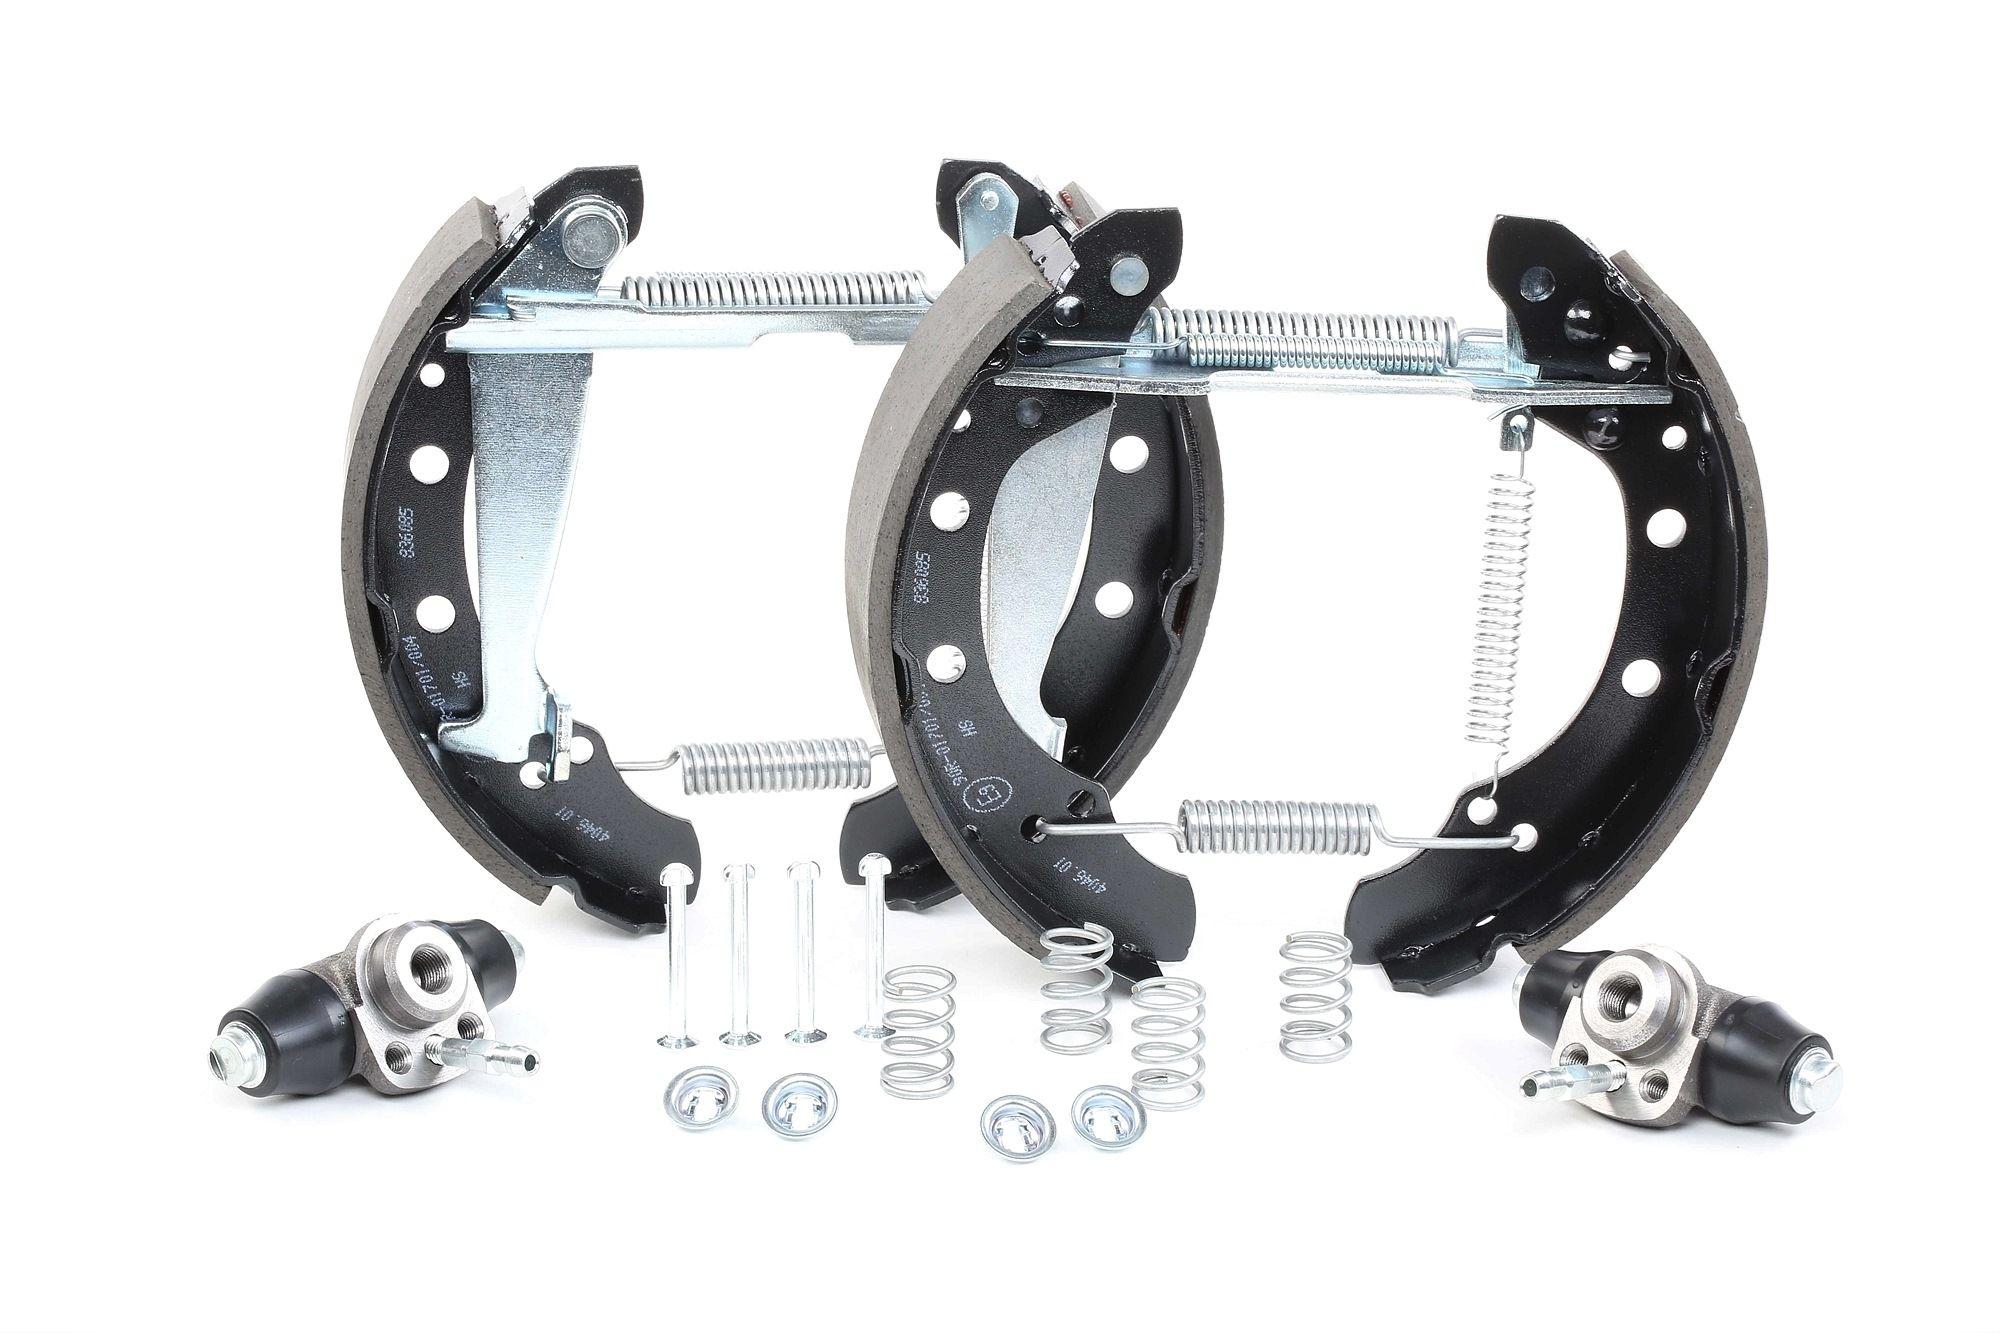 ROADHOUSE Brake Set, drum brakes VW,AUDI,SEAT SPK 3046.01 VAGKFS21,VAGKFS21,VAGKFS21